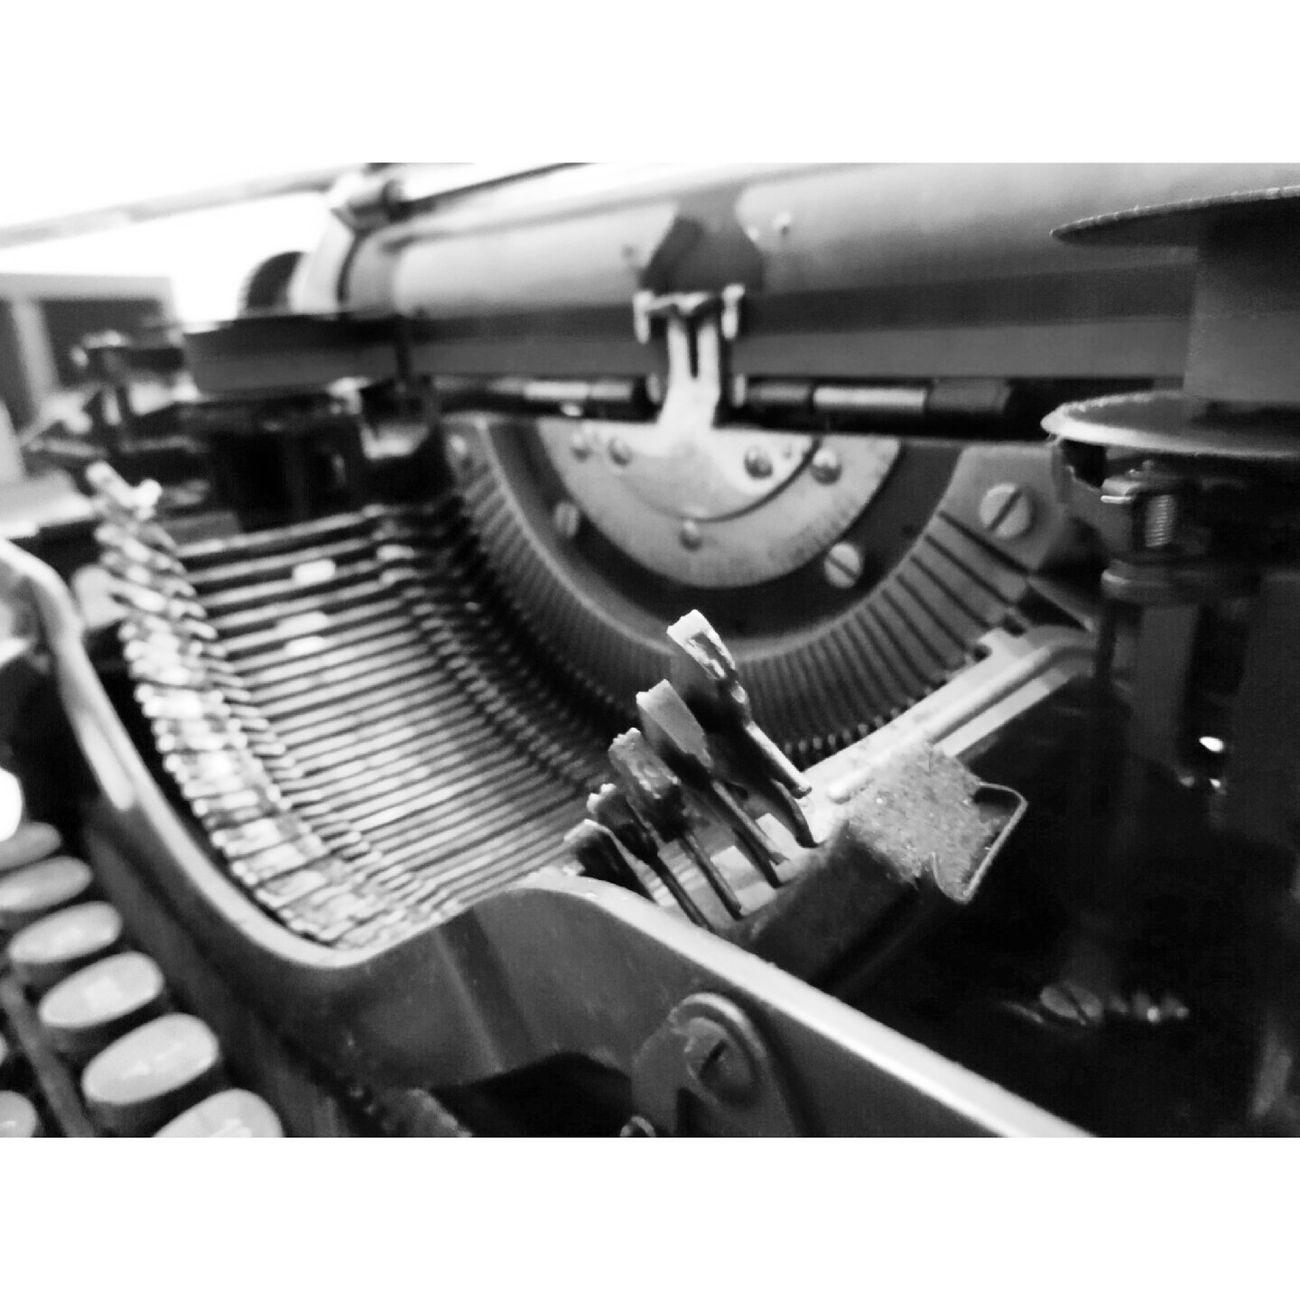 Typewriter Daktilo Letters Hgstudyo